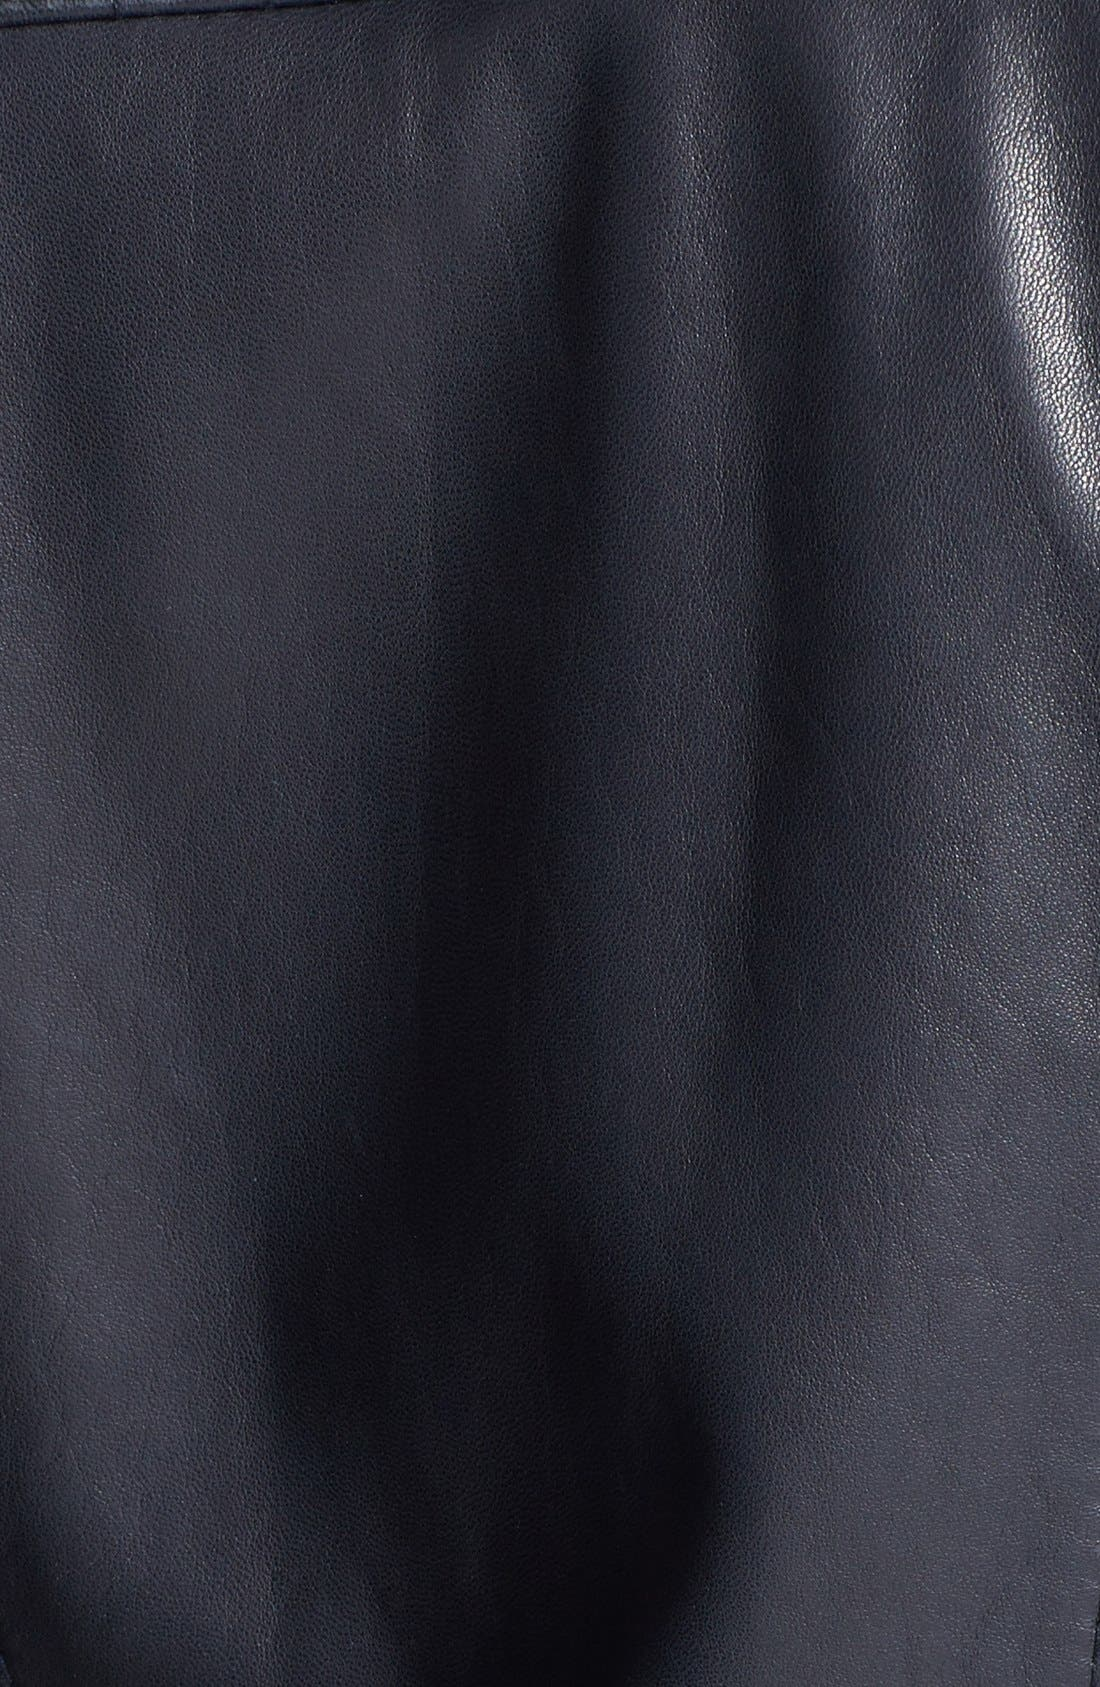 Alternate Image 3  - Marc New York Channel Quilt Leather Moto Jacket